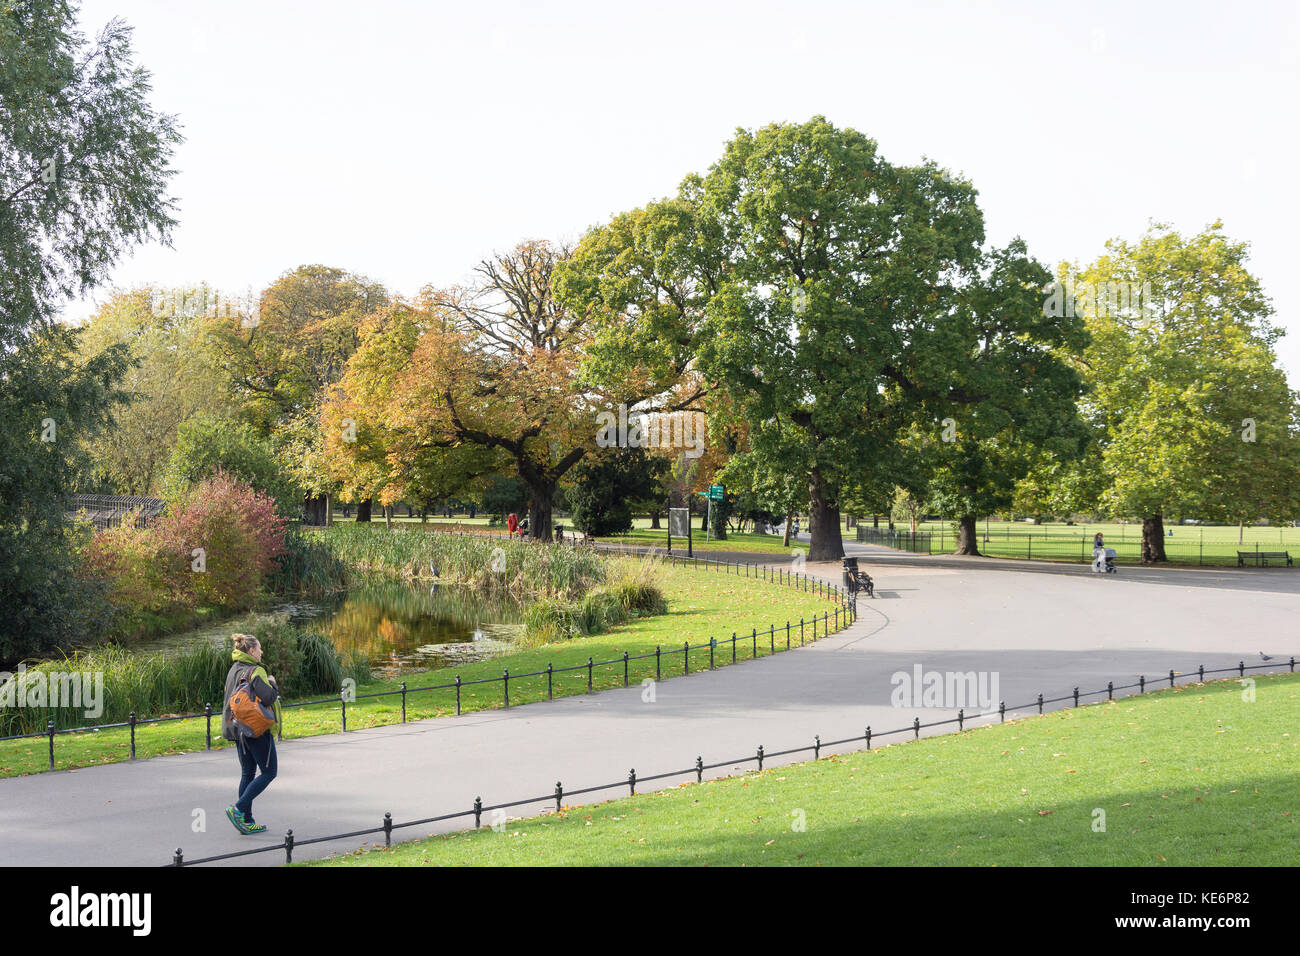 Clissold Gardens, Stoke Newington, London Borough of Hackney, Greater London, Angleterre, Royaume-Uni Photo Stock